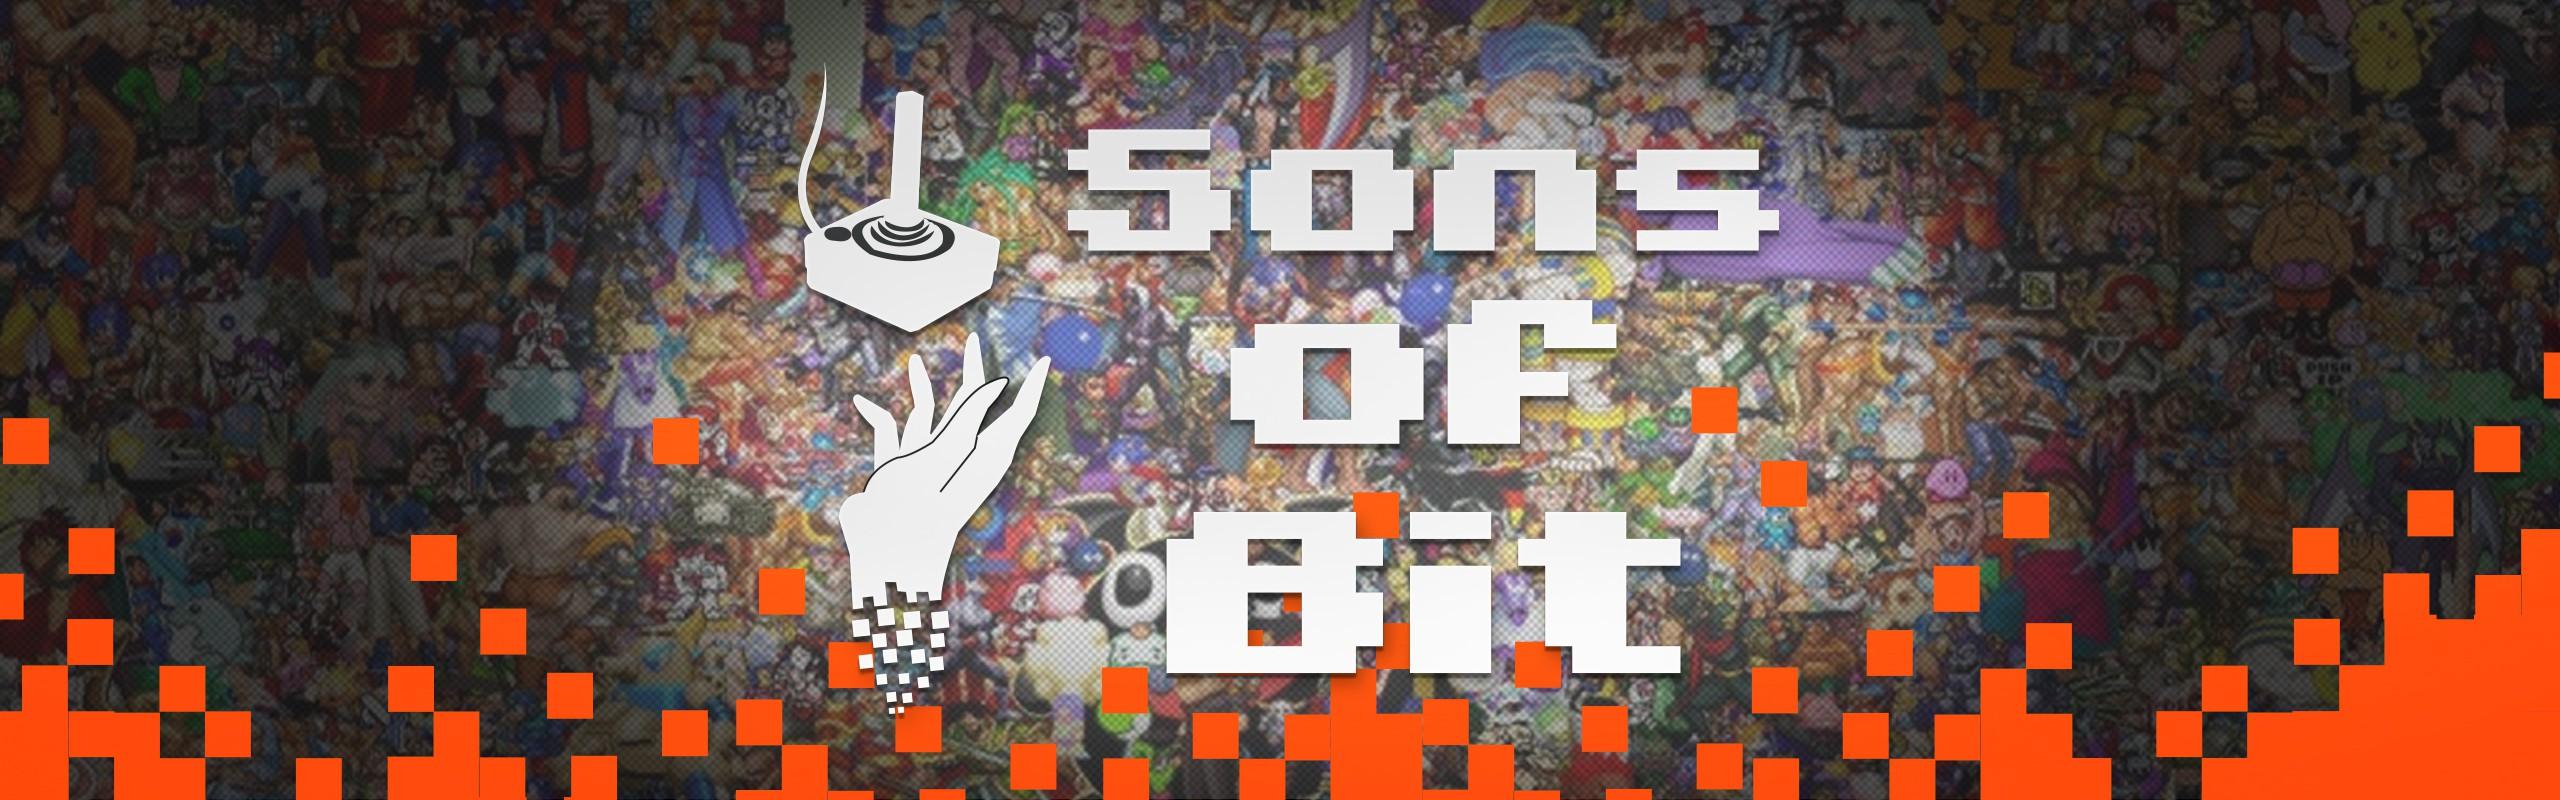 Sons Of Bit